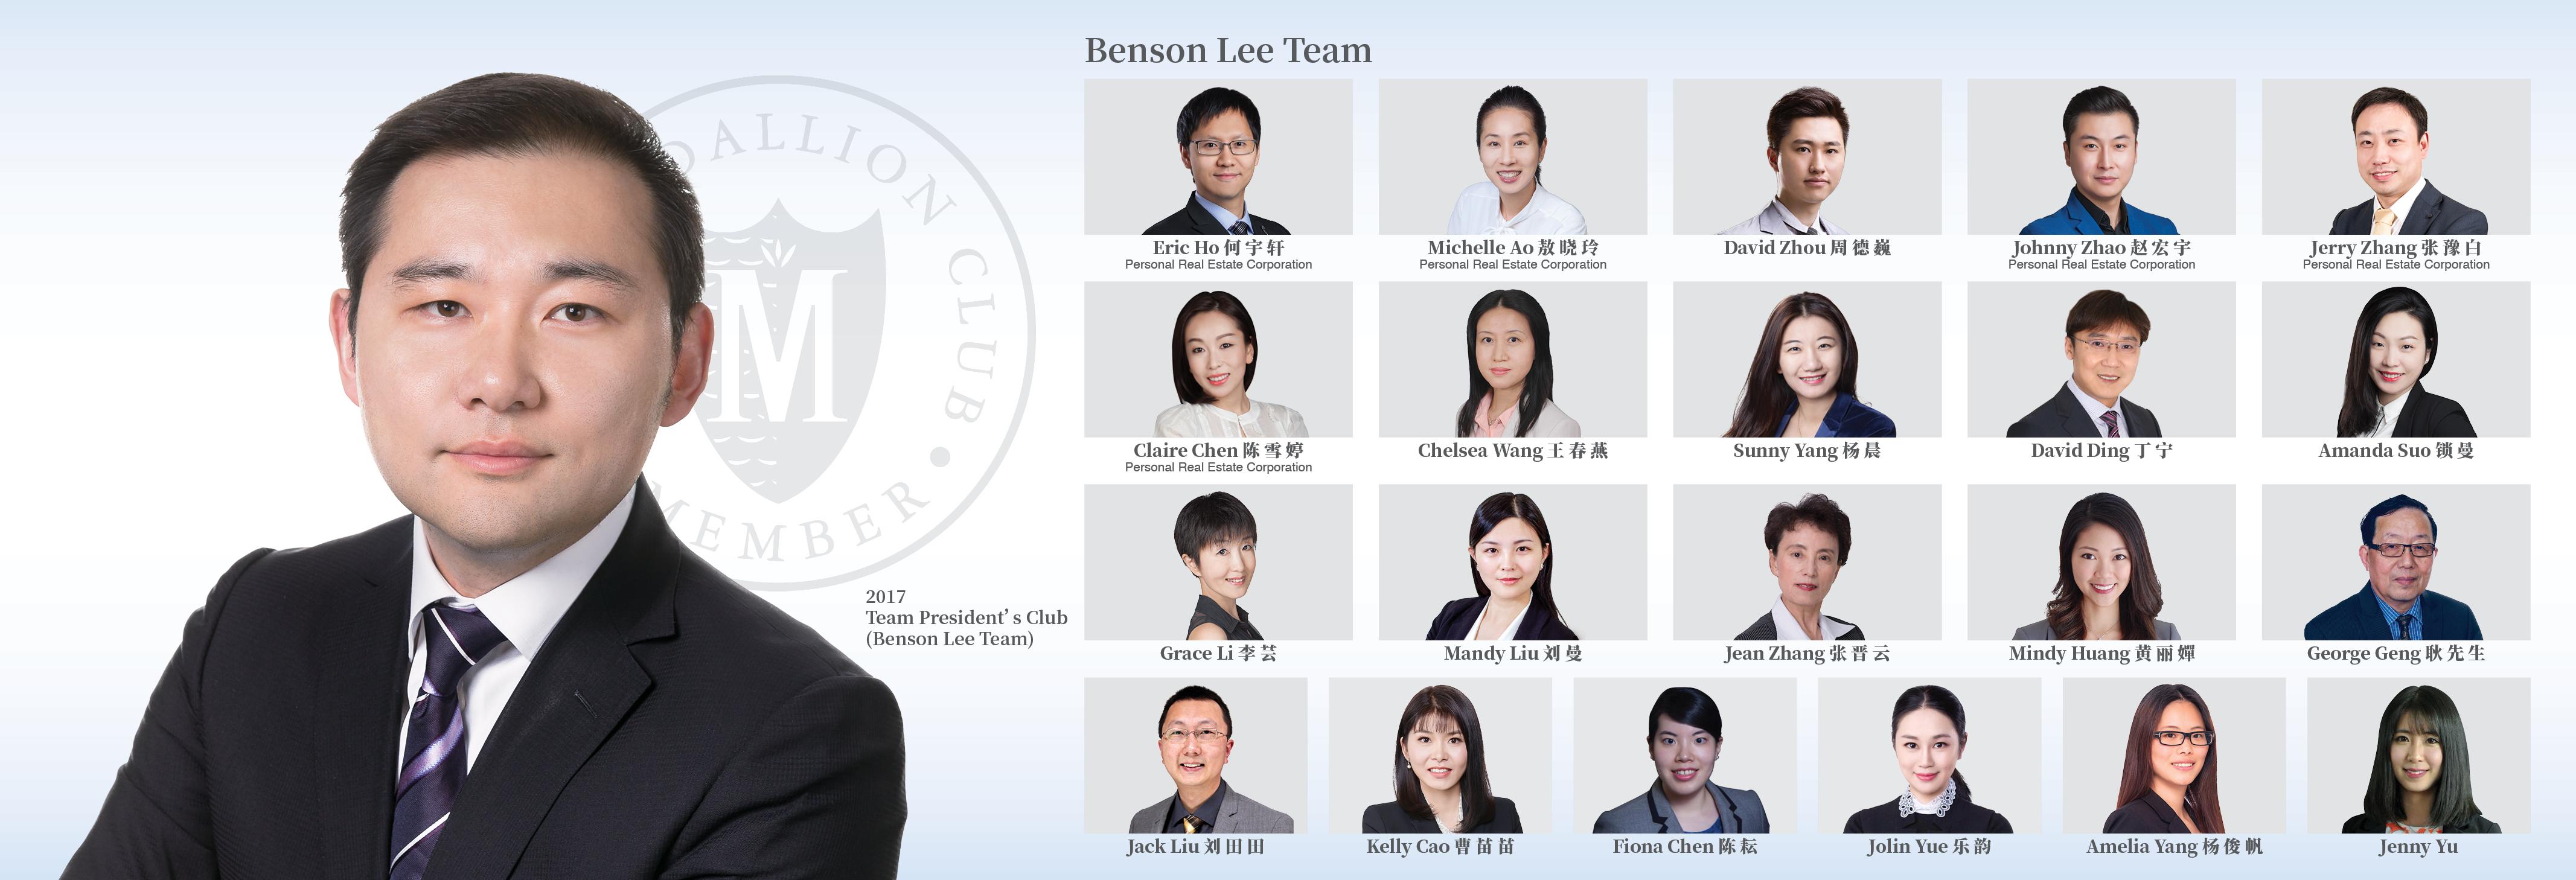 Benson Lee Team